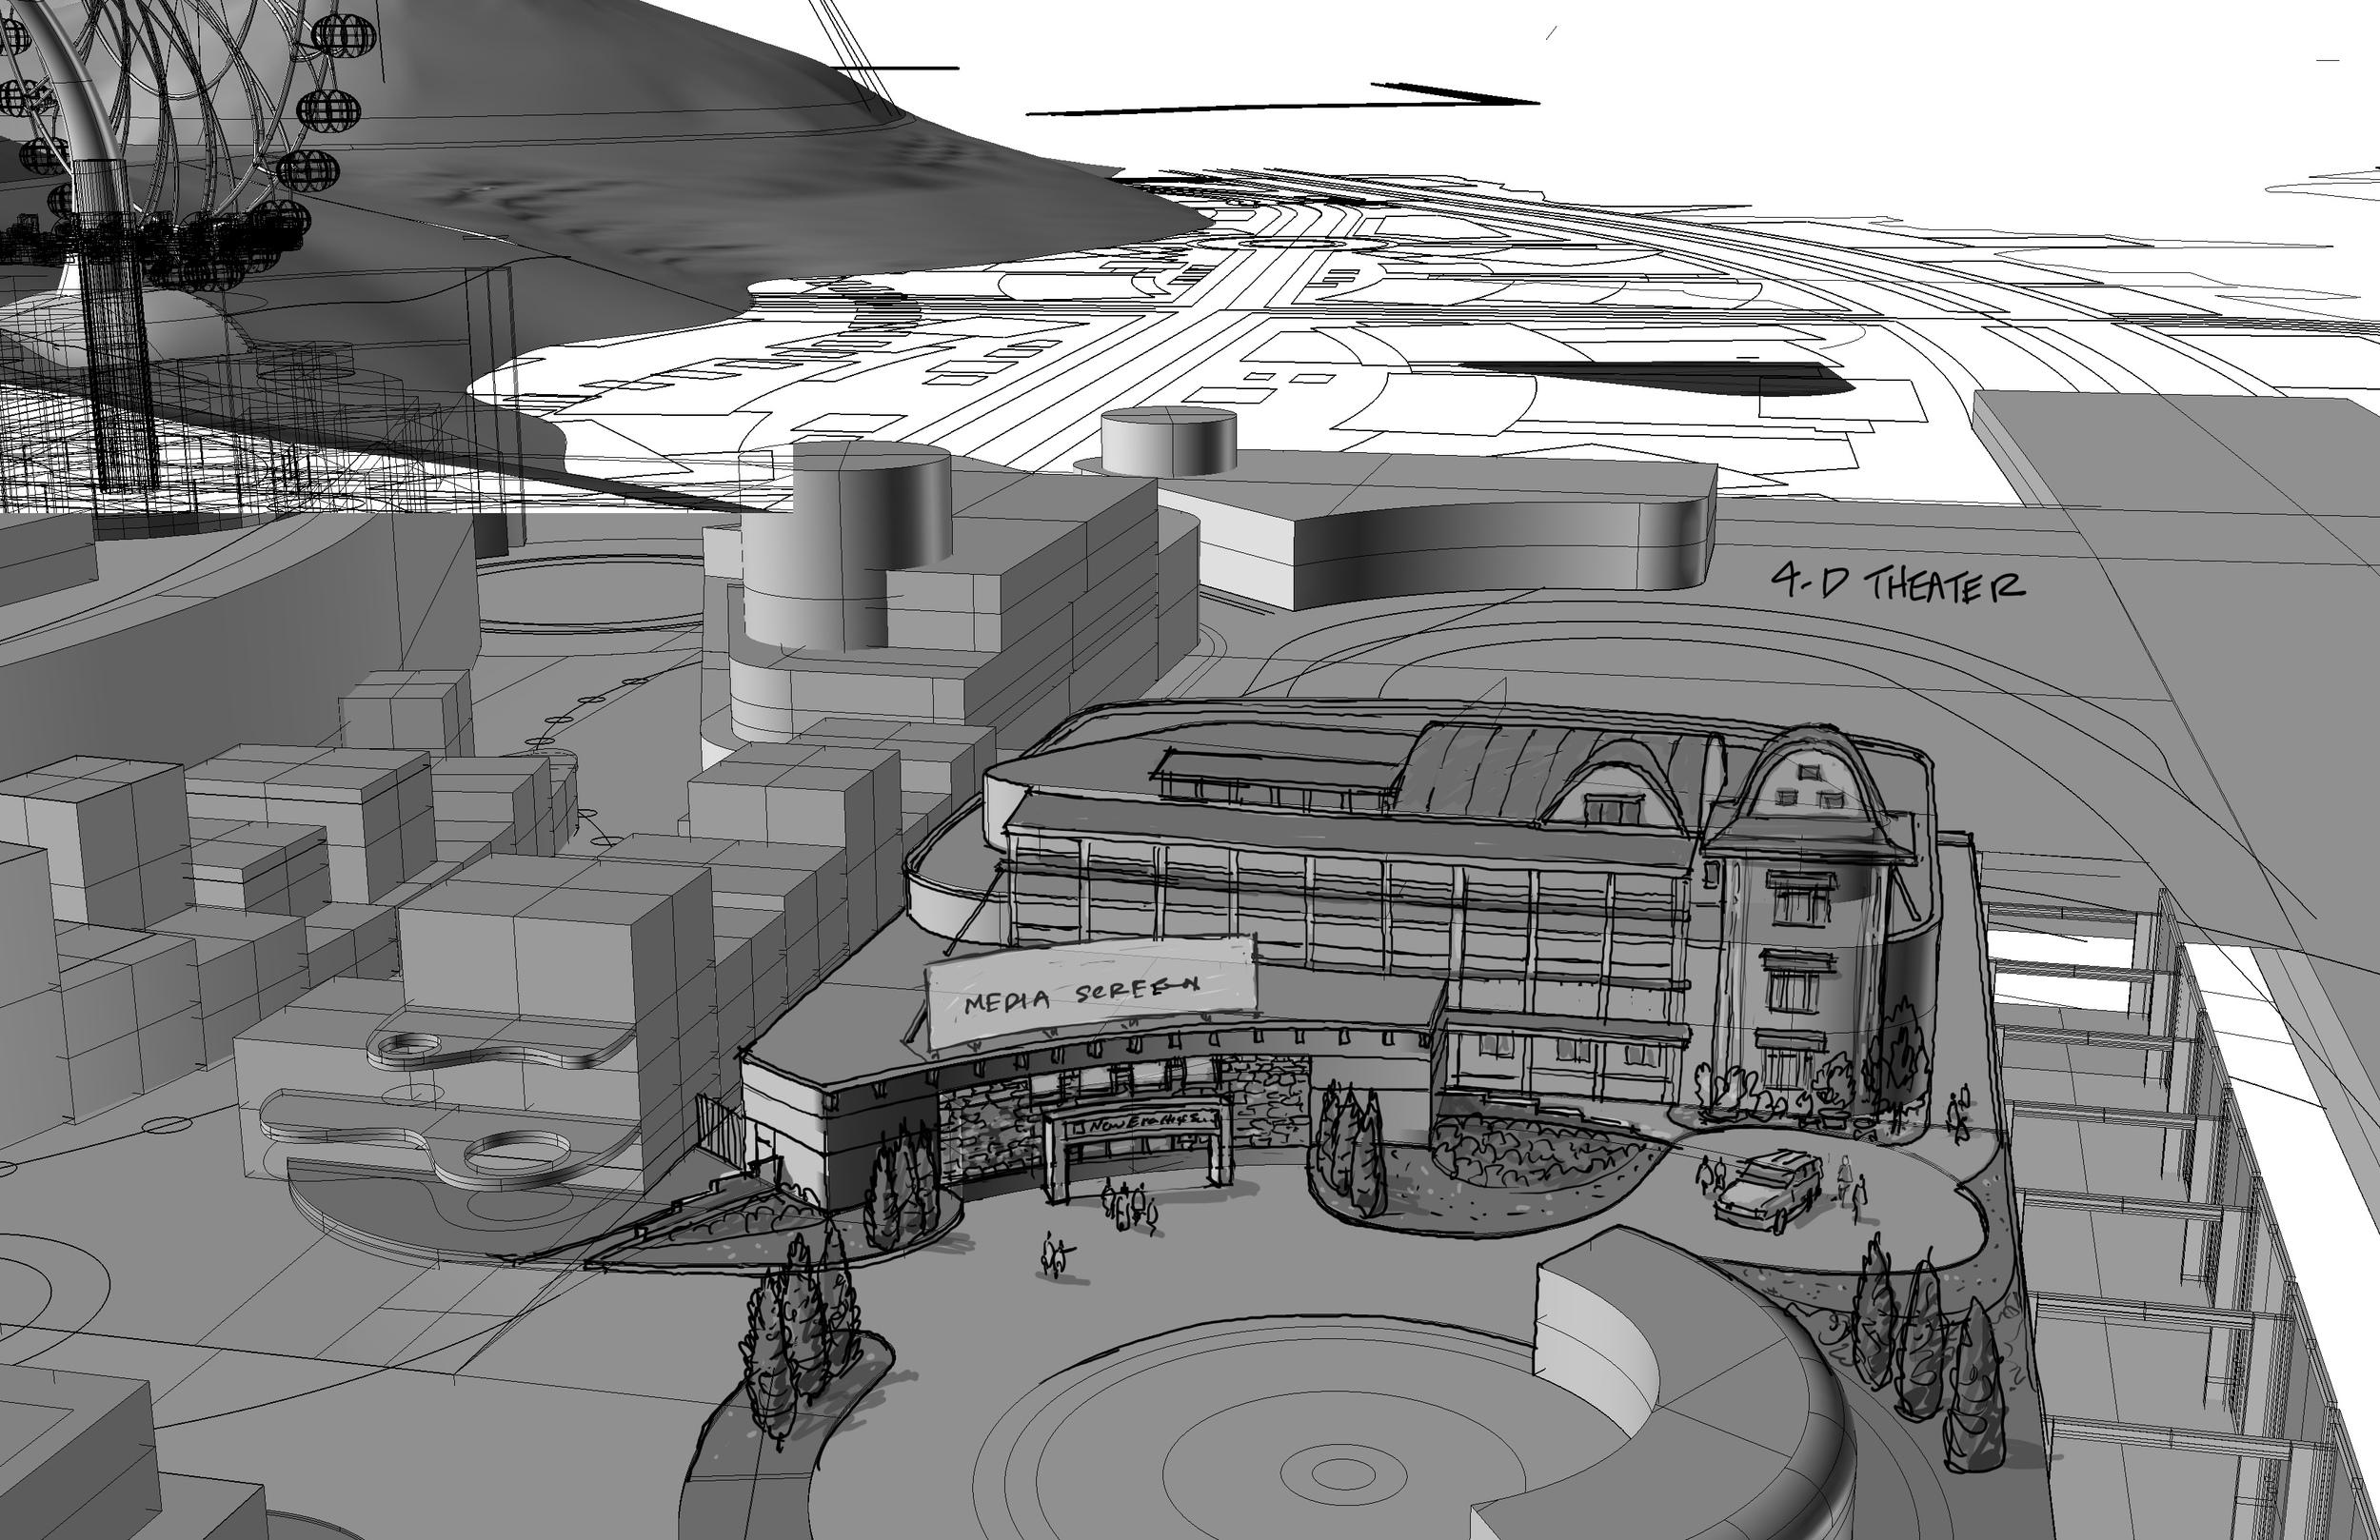 4-D Theater with Rhino.jpg